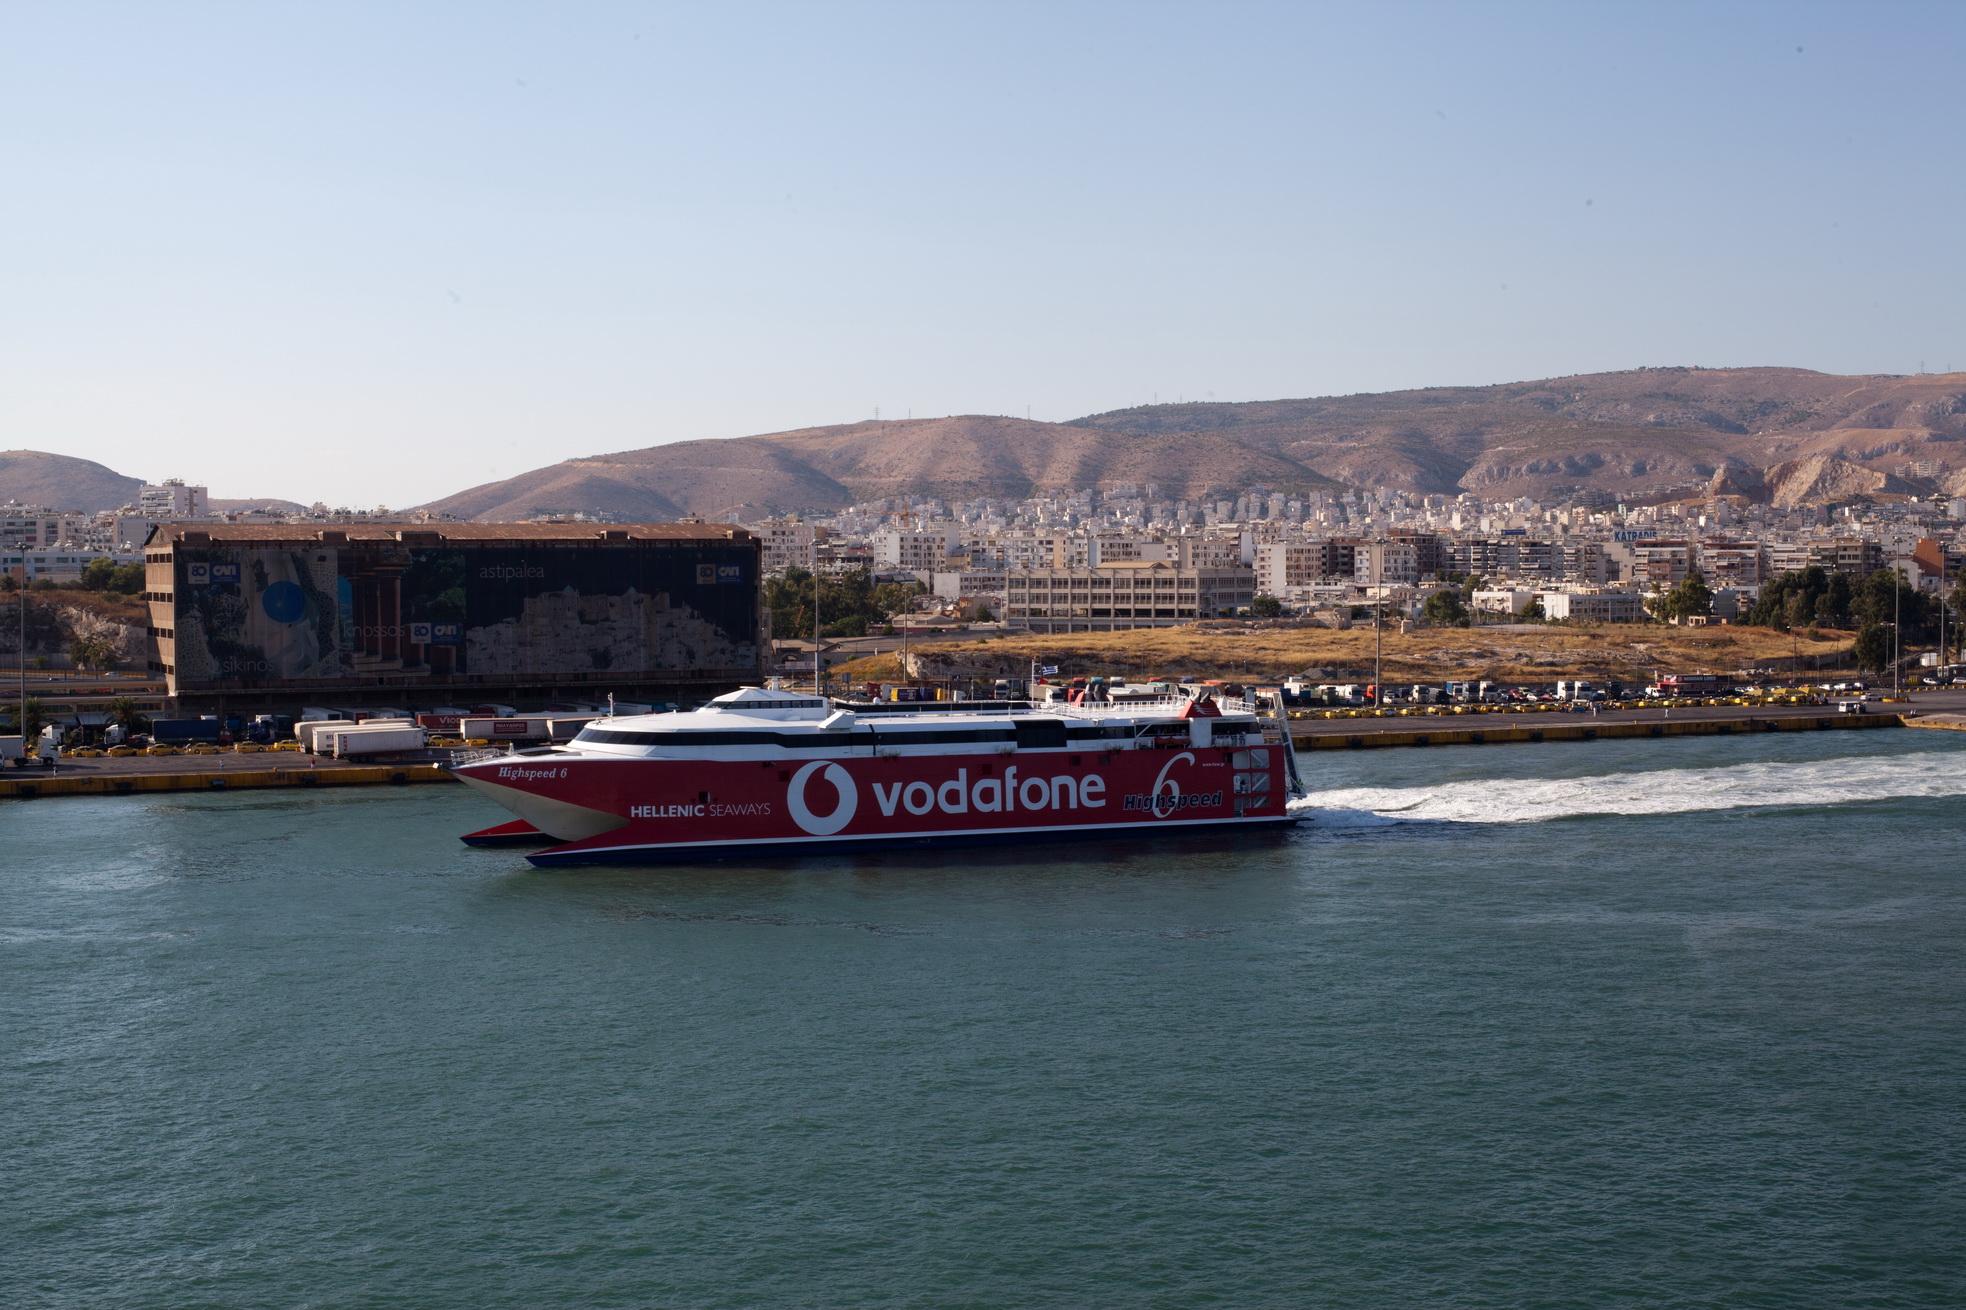 MS Highspeed 6 IMO 9221346 Hellenic Seaways leaving Piraeus Port of Athens Greece 02